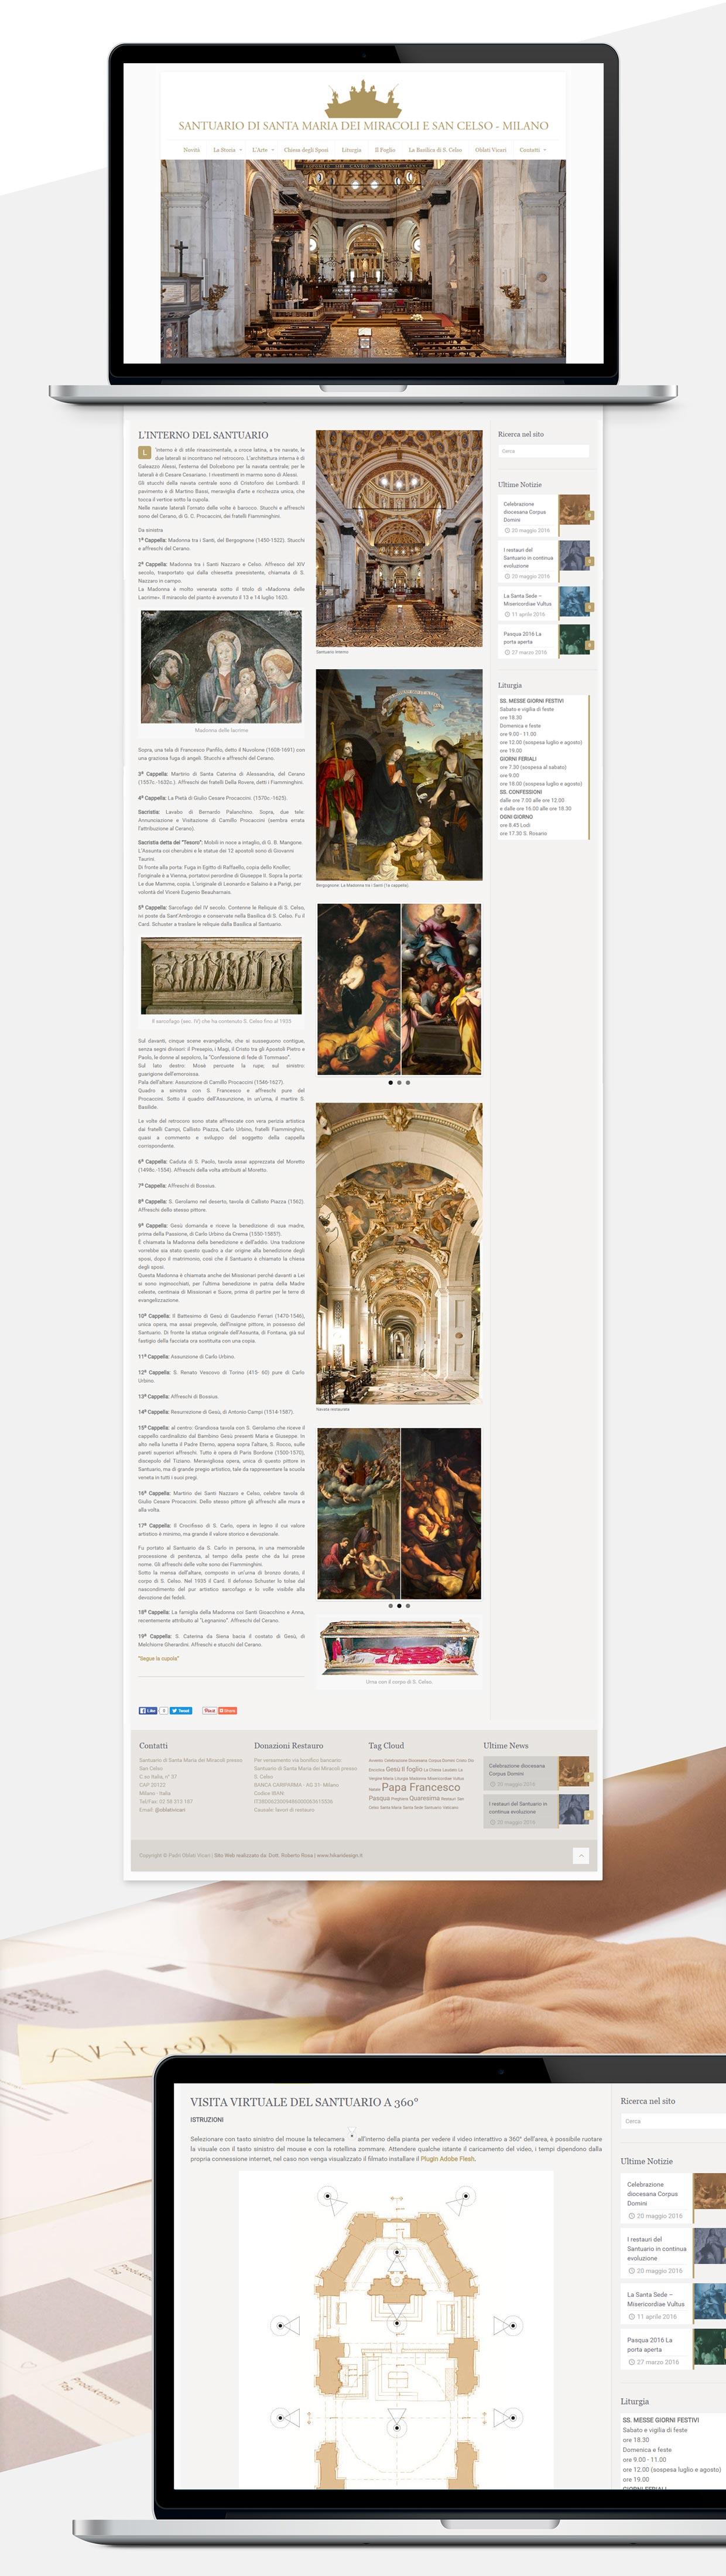 Santa Maria Web Site